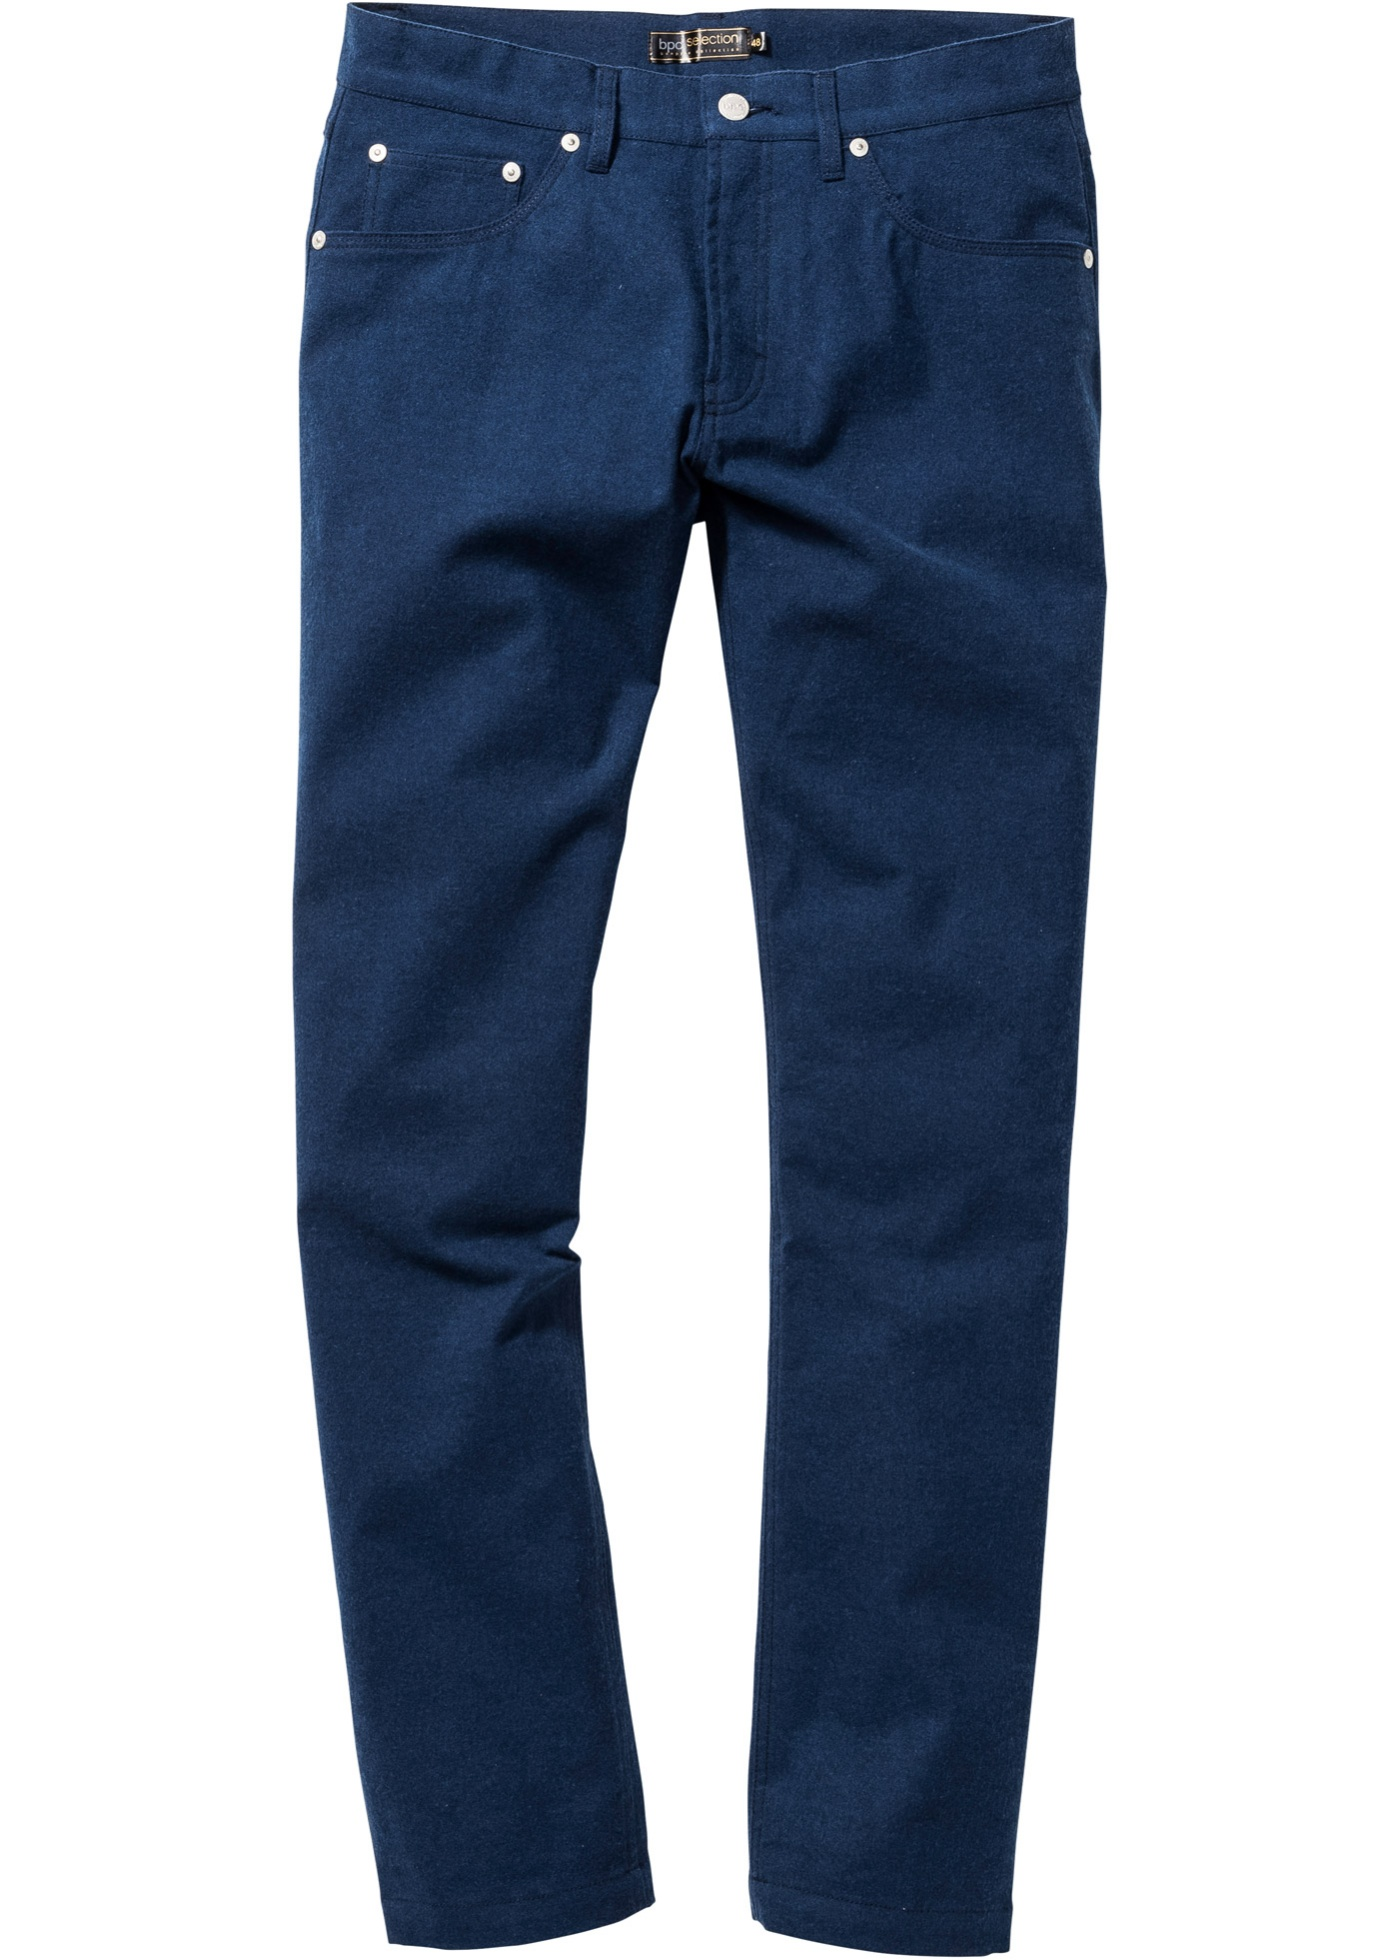 Pantalone 5 tasche flanel